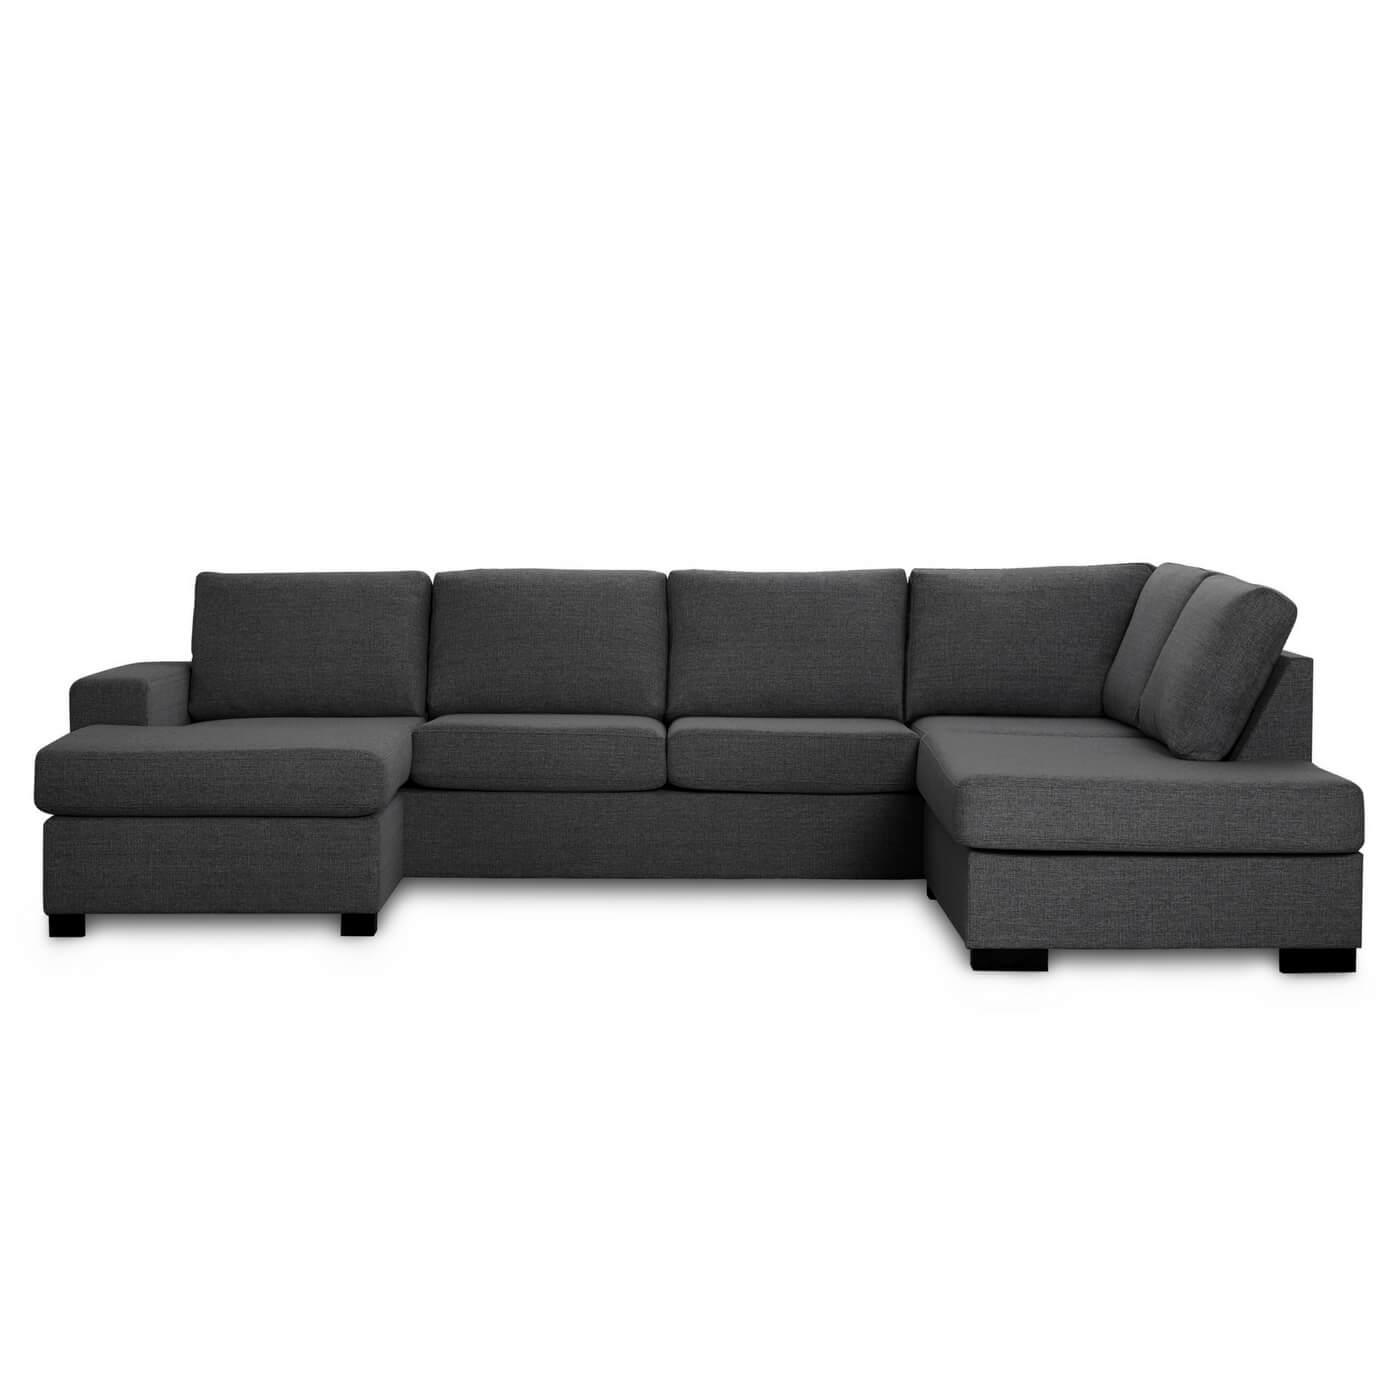 Milan højrevendt U-sofa - antracitgrå stof